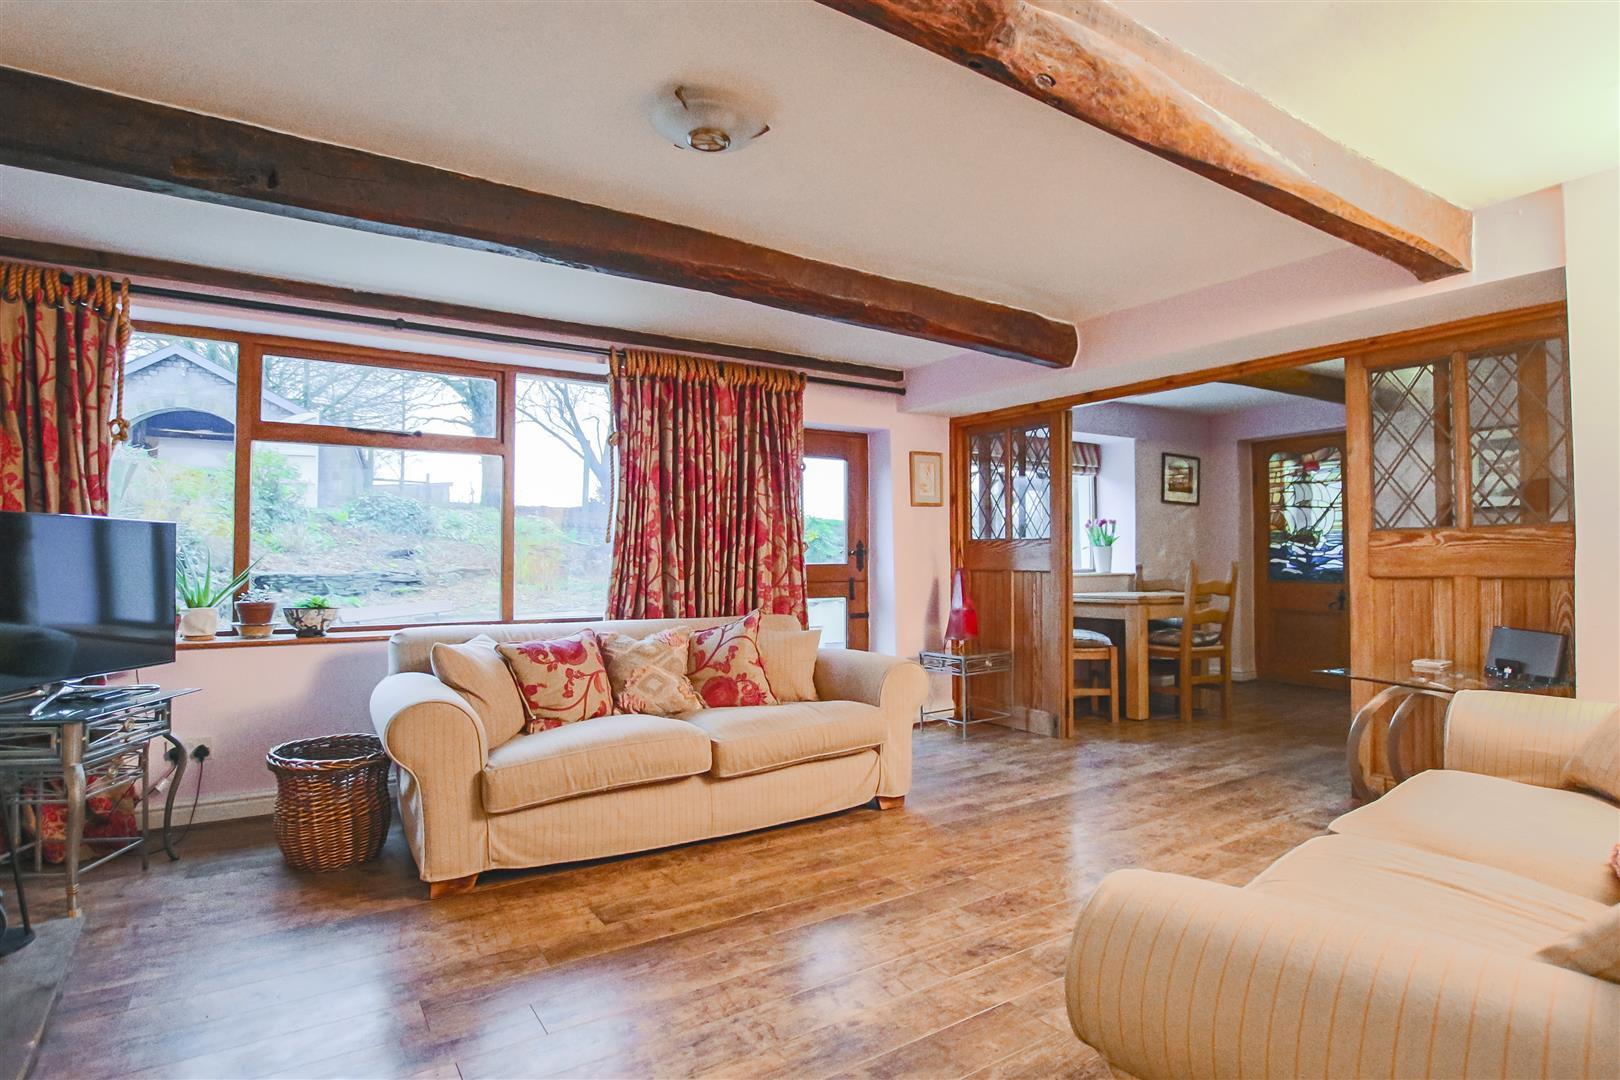 2 Bedroom Cottage For Sale - First Reception Room